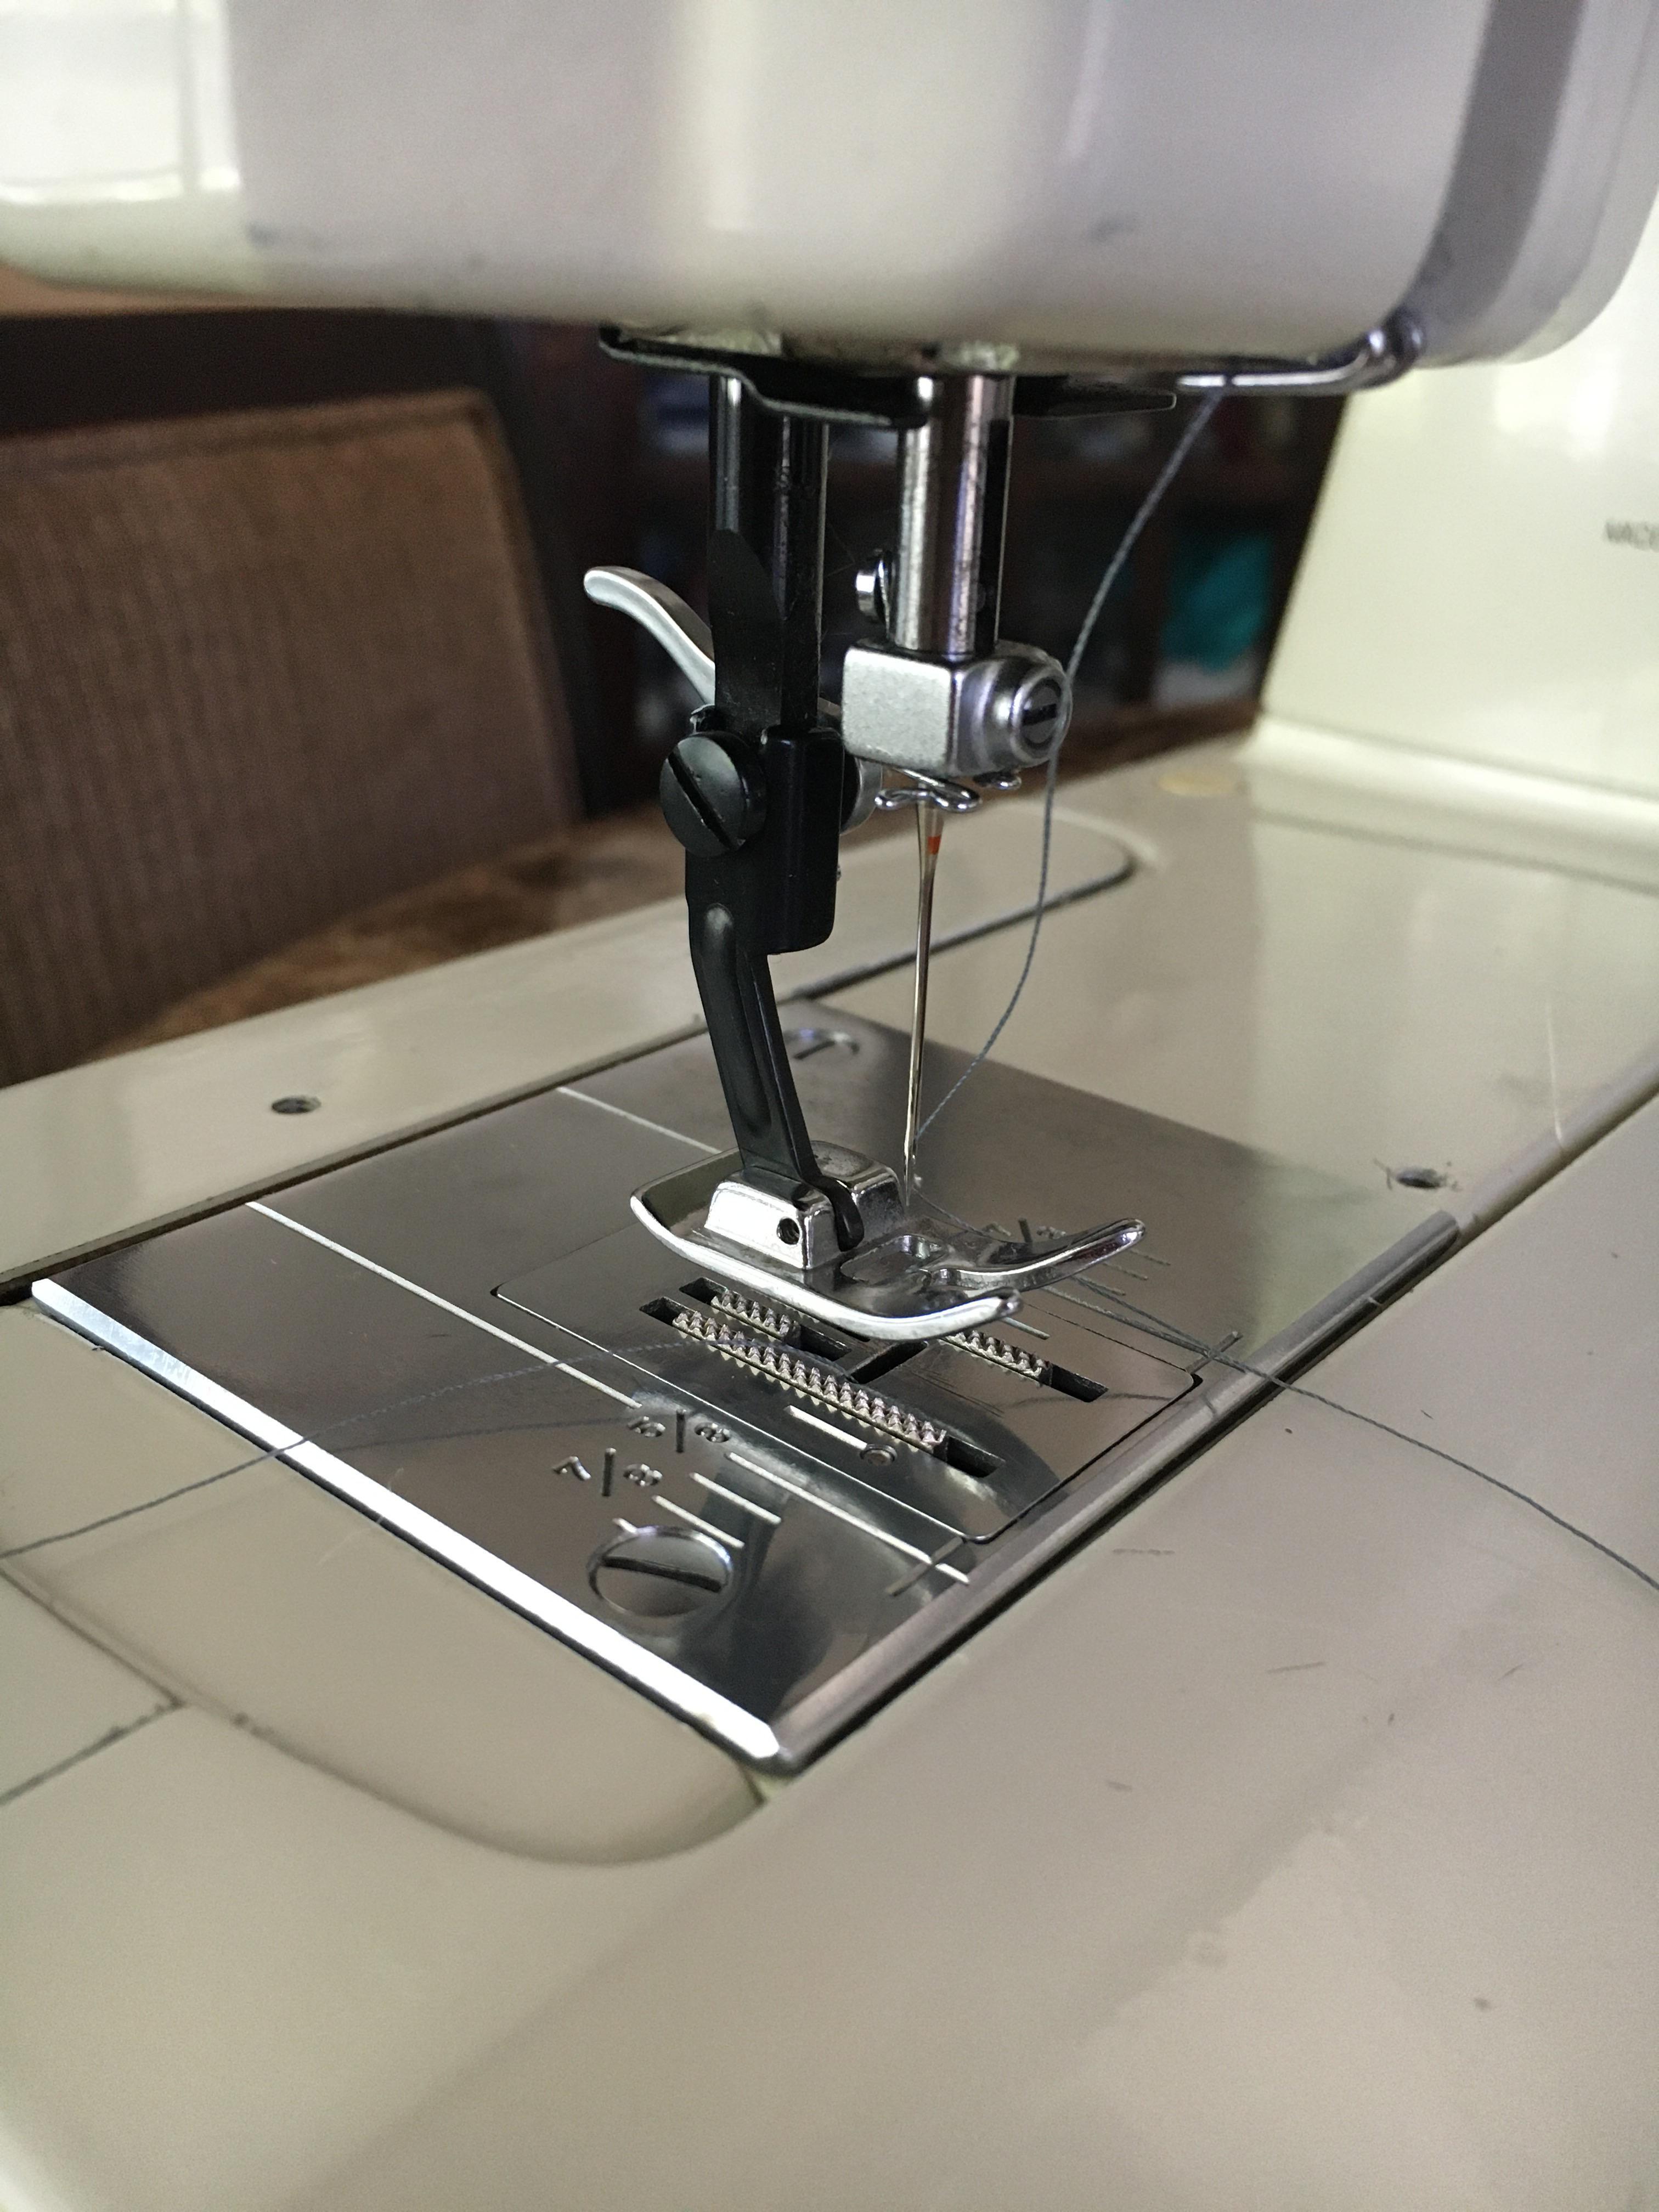 Kenmore Sewing Machine Feet : kenmore, sewing, machine, Kenmore, Super, Shank, Presser, Question, Sewing